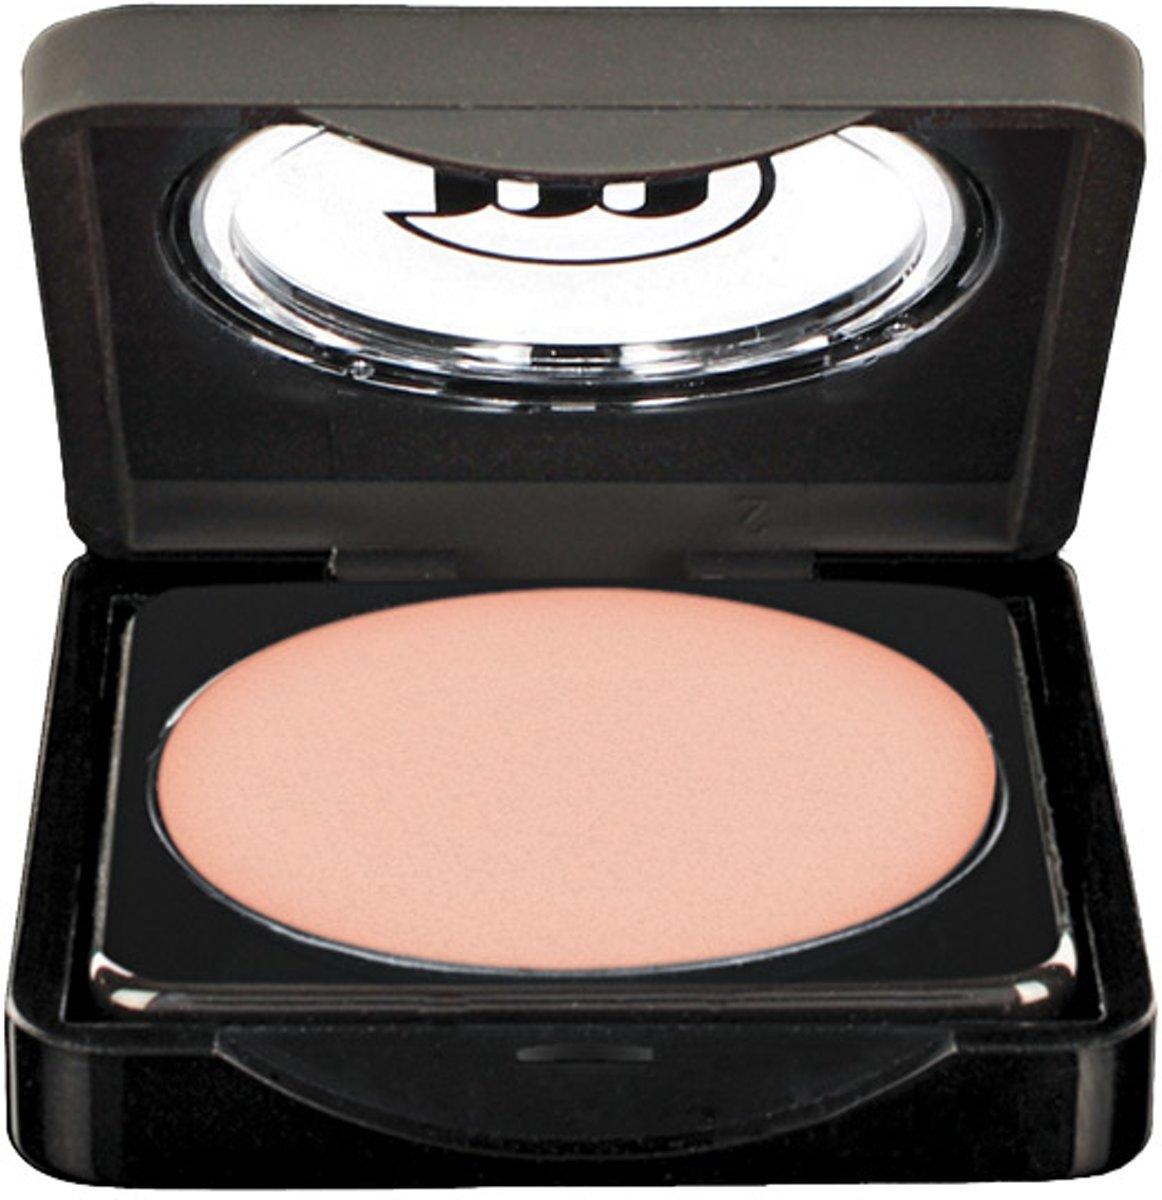 Make-up Studio Eyeshadow in box type B Wet & Dry Oogschaduw - 426